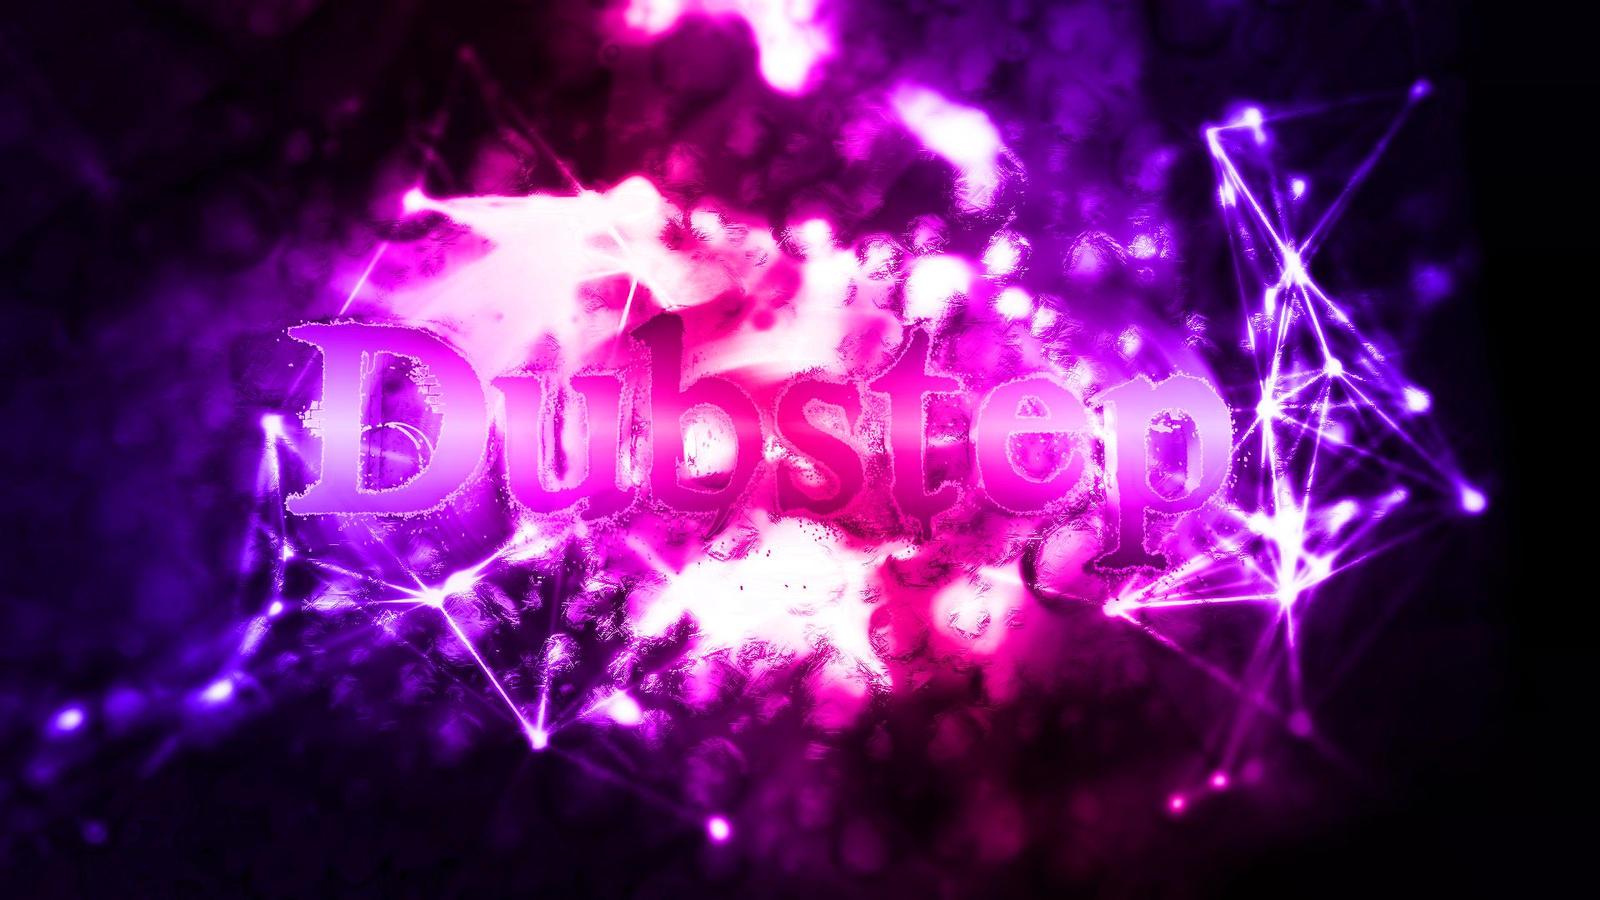 purple dubstep wallpaper by - photo #7